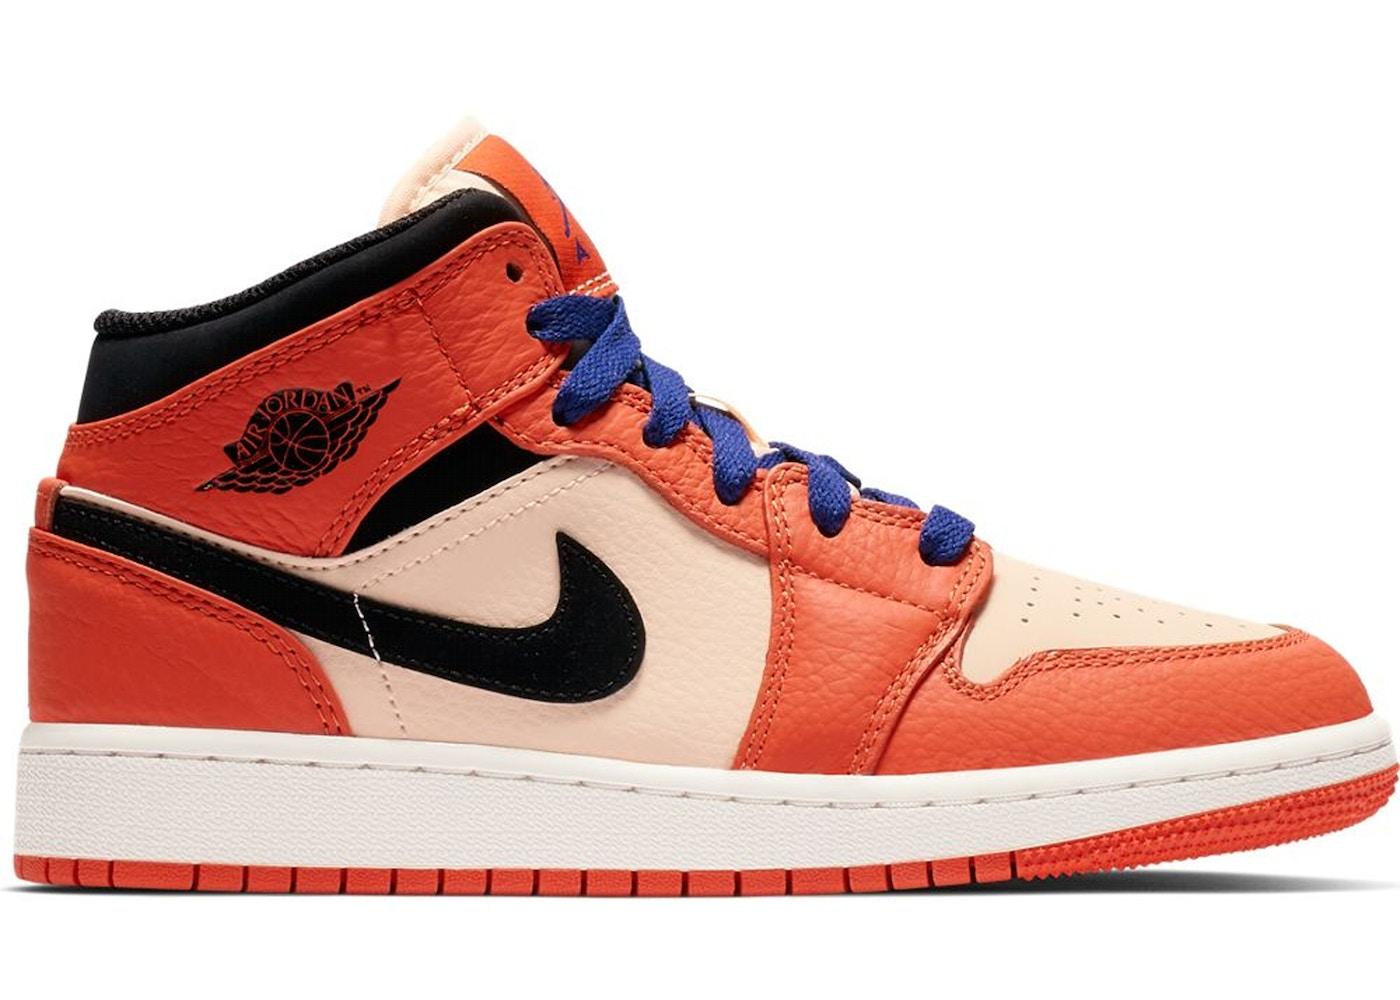 269fa2912026 Jordan 1 Mid Team Orange Black (GS) - BQ6931-800